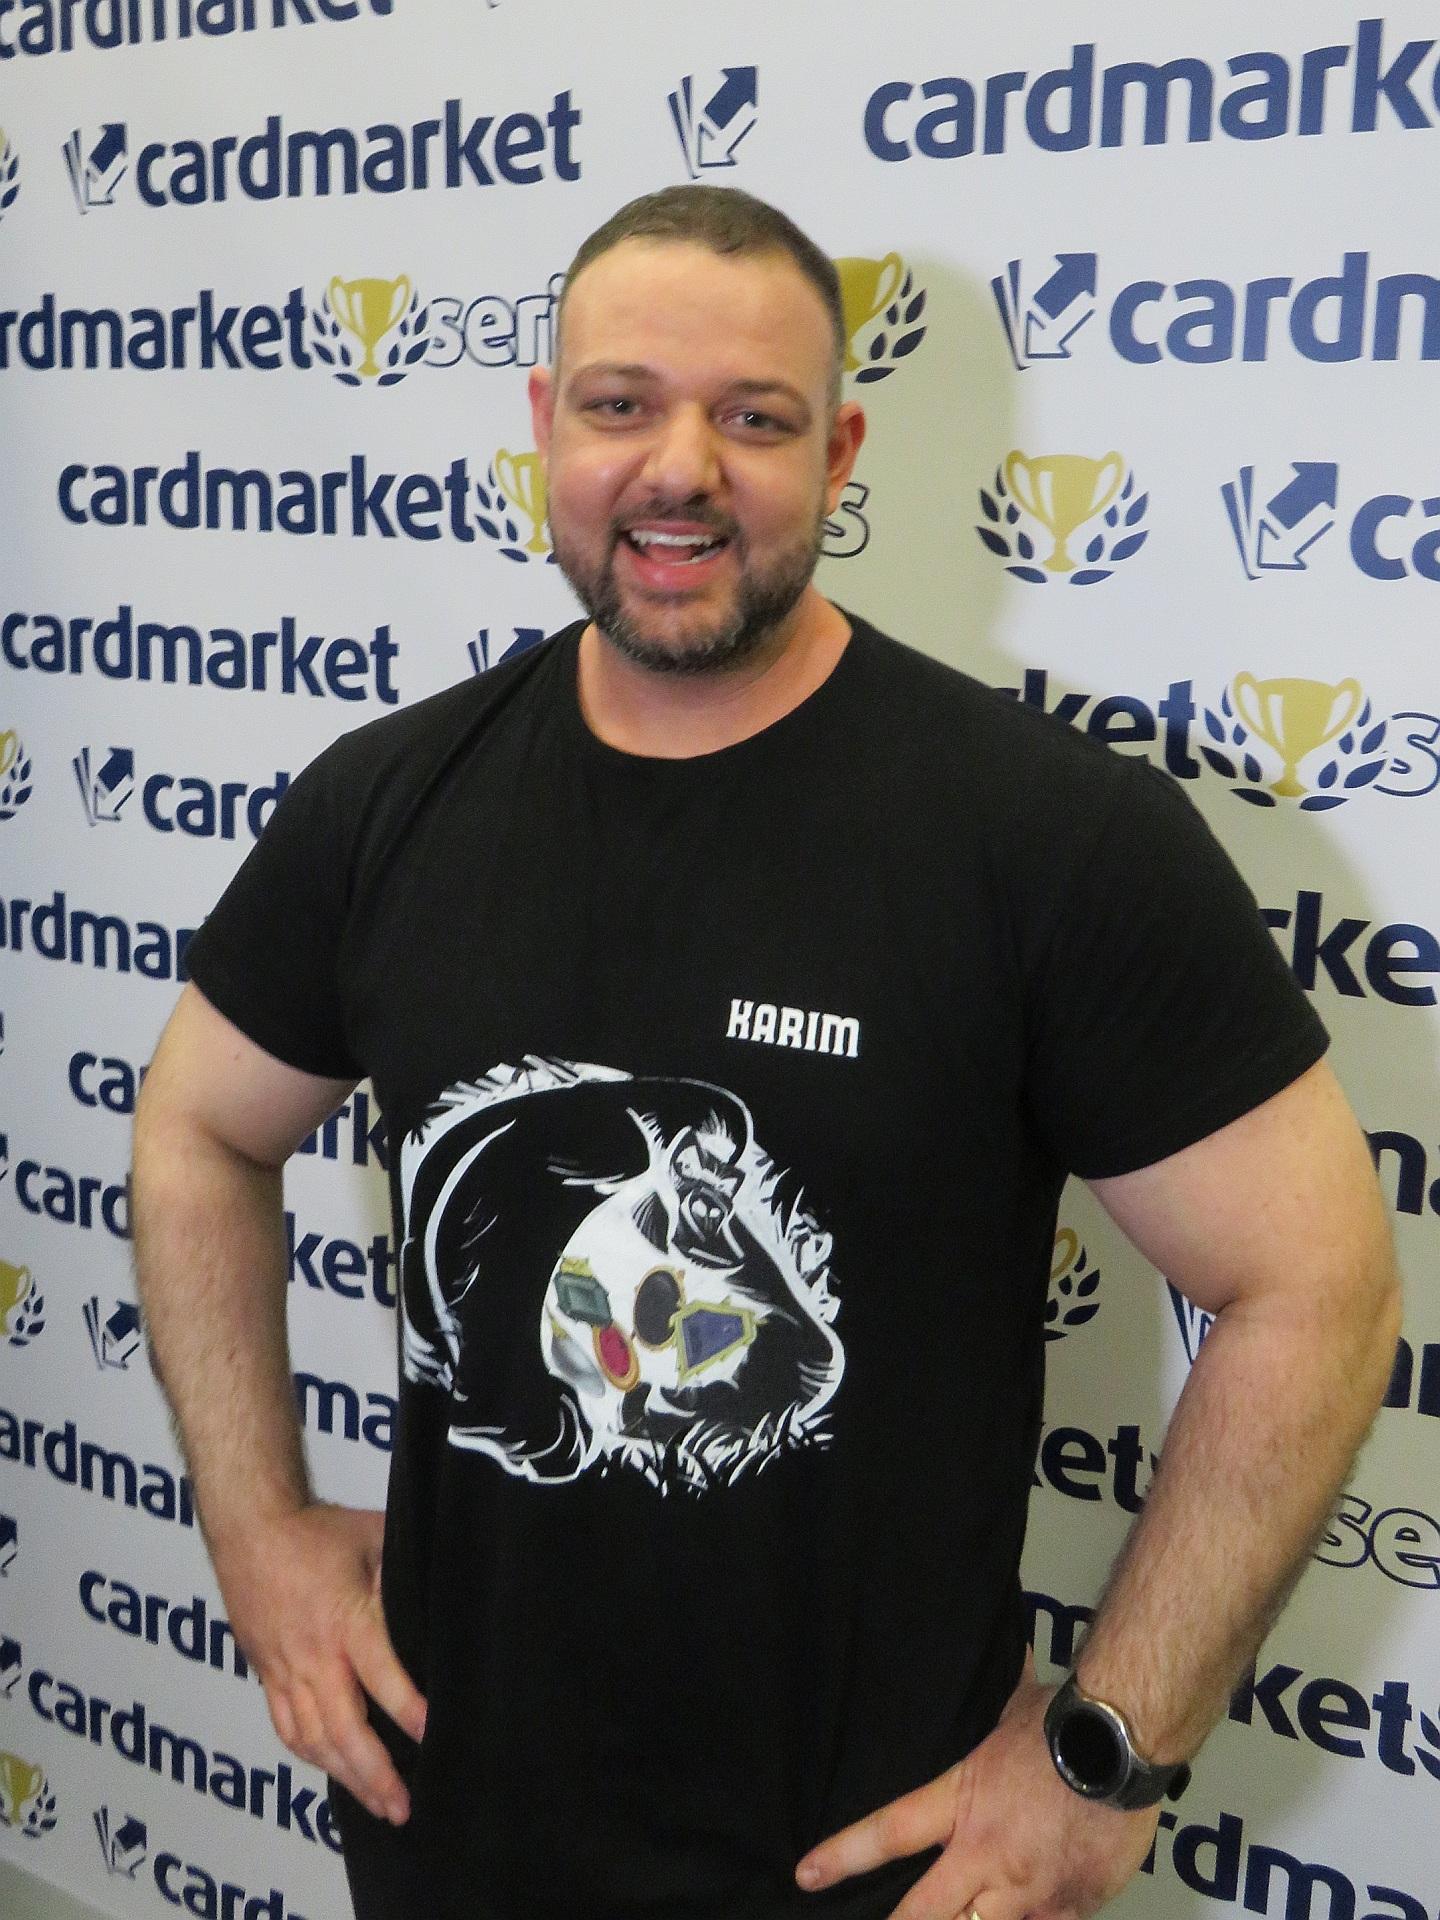 Karim Koussa